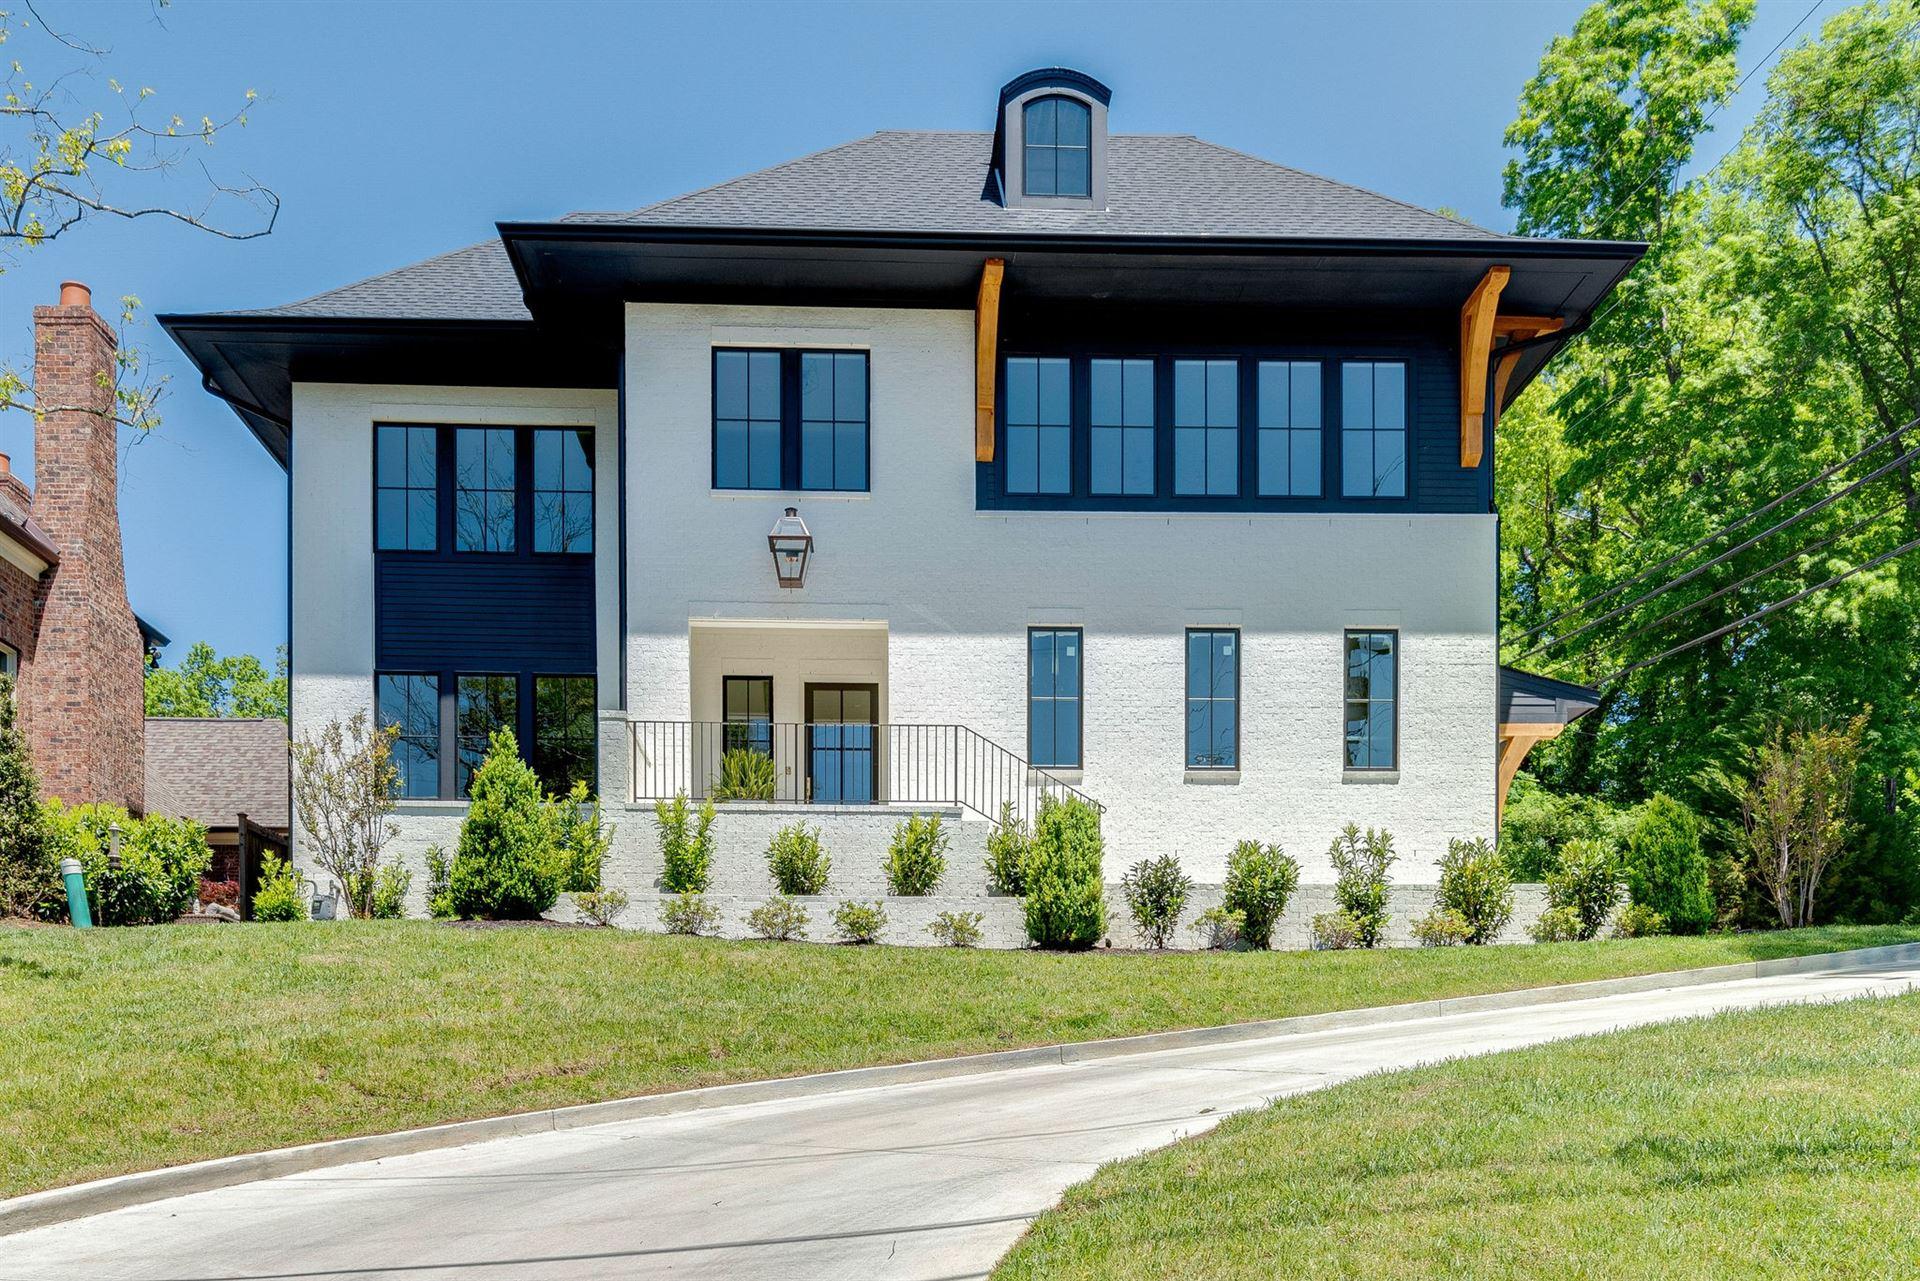 Photo of 2800 Valley Brook Place, Nashville, TN 37215 (MLS # 2150141)